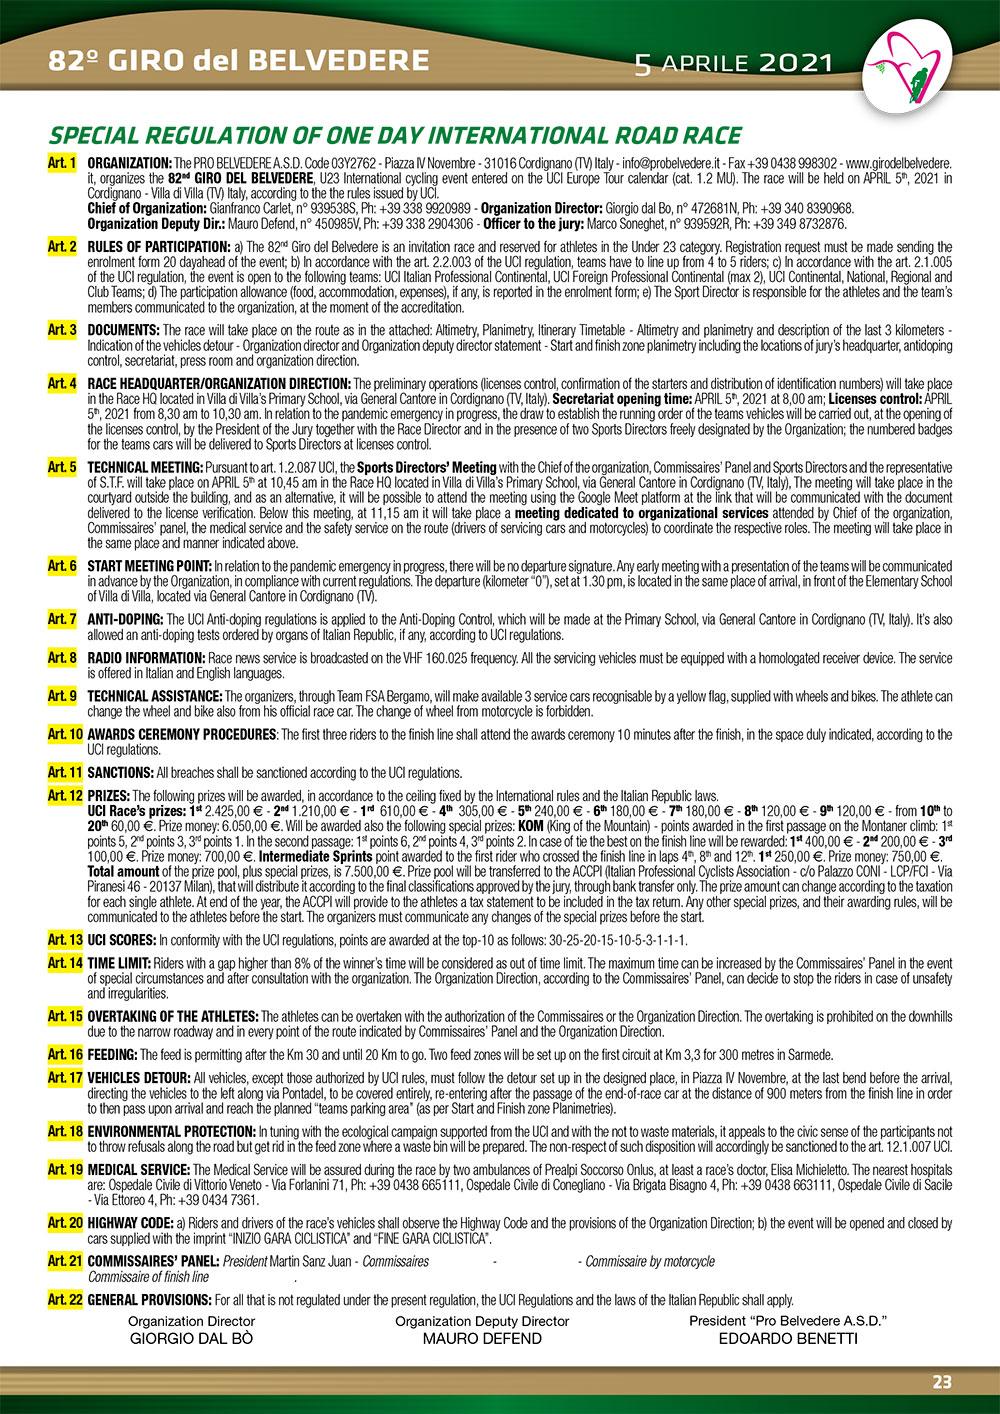 Giro del Belvedere - Rules 2017